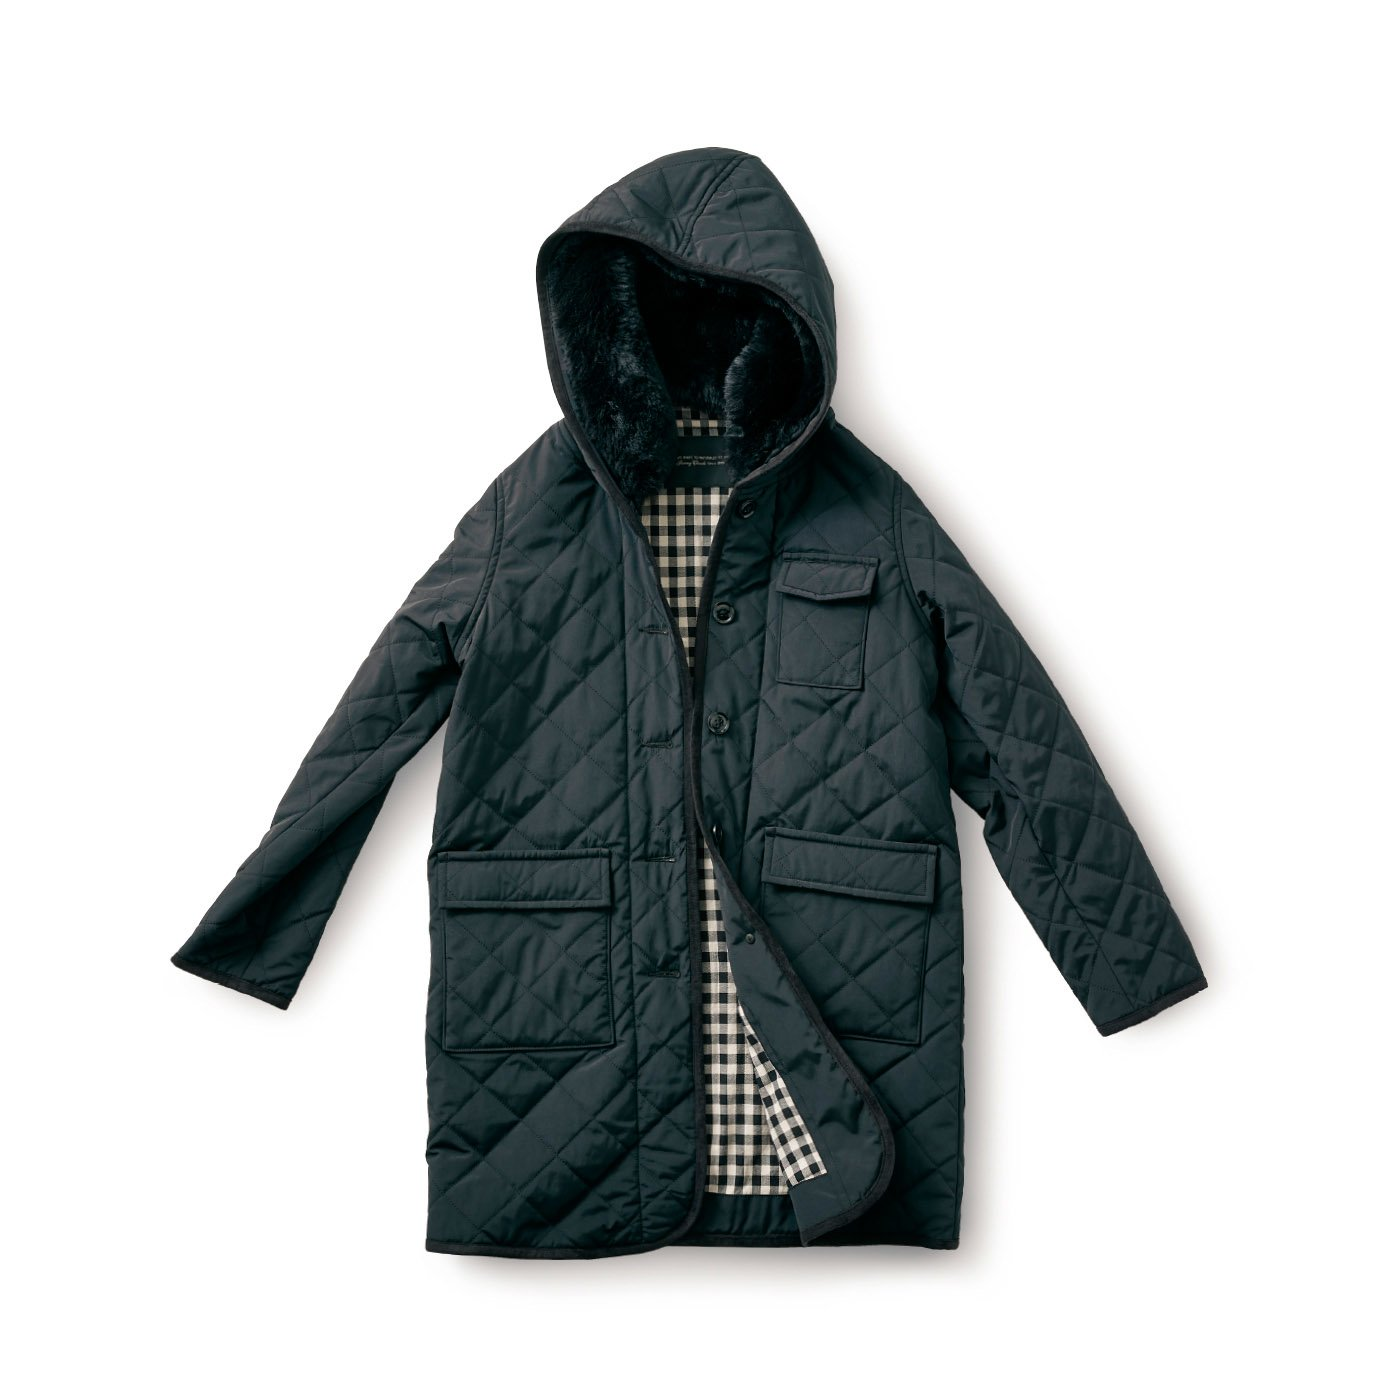 SUNNY CLOUDS 漆黒のキルトコート〈レディース〉